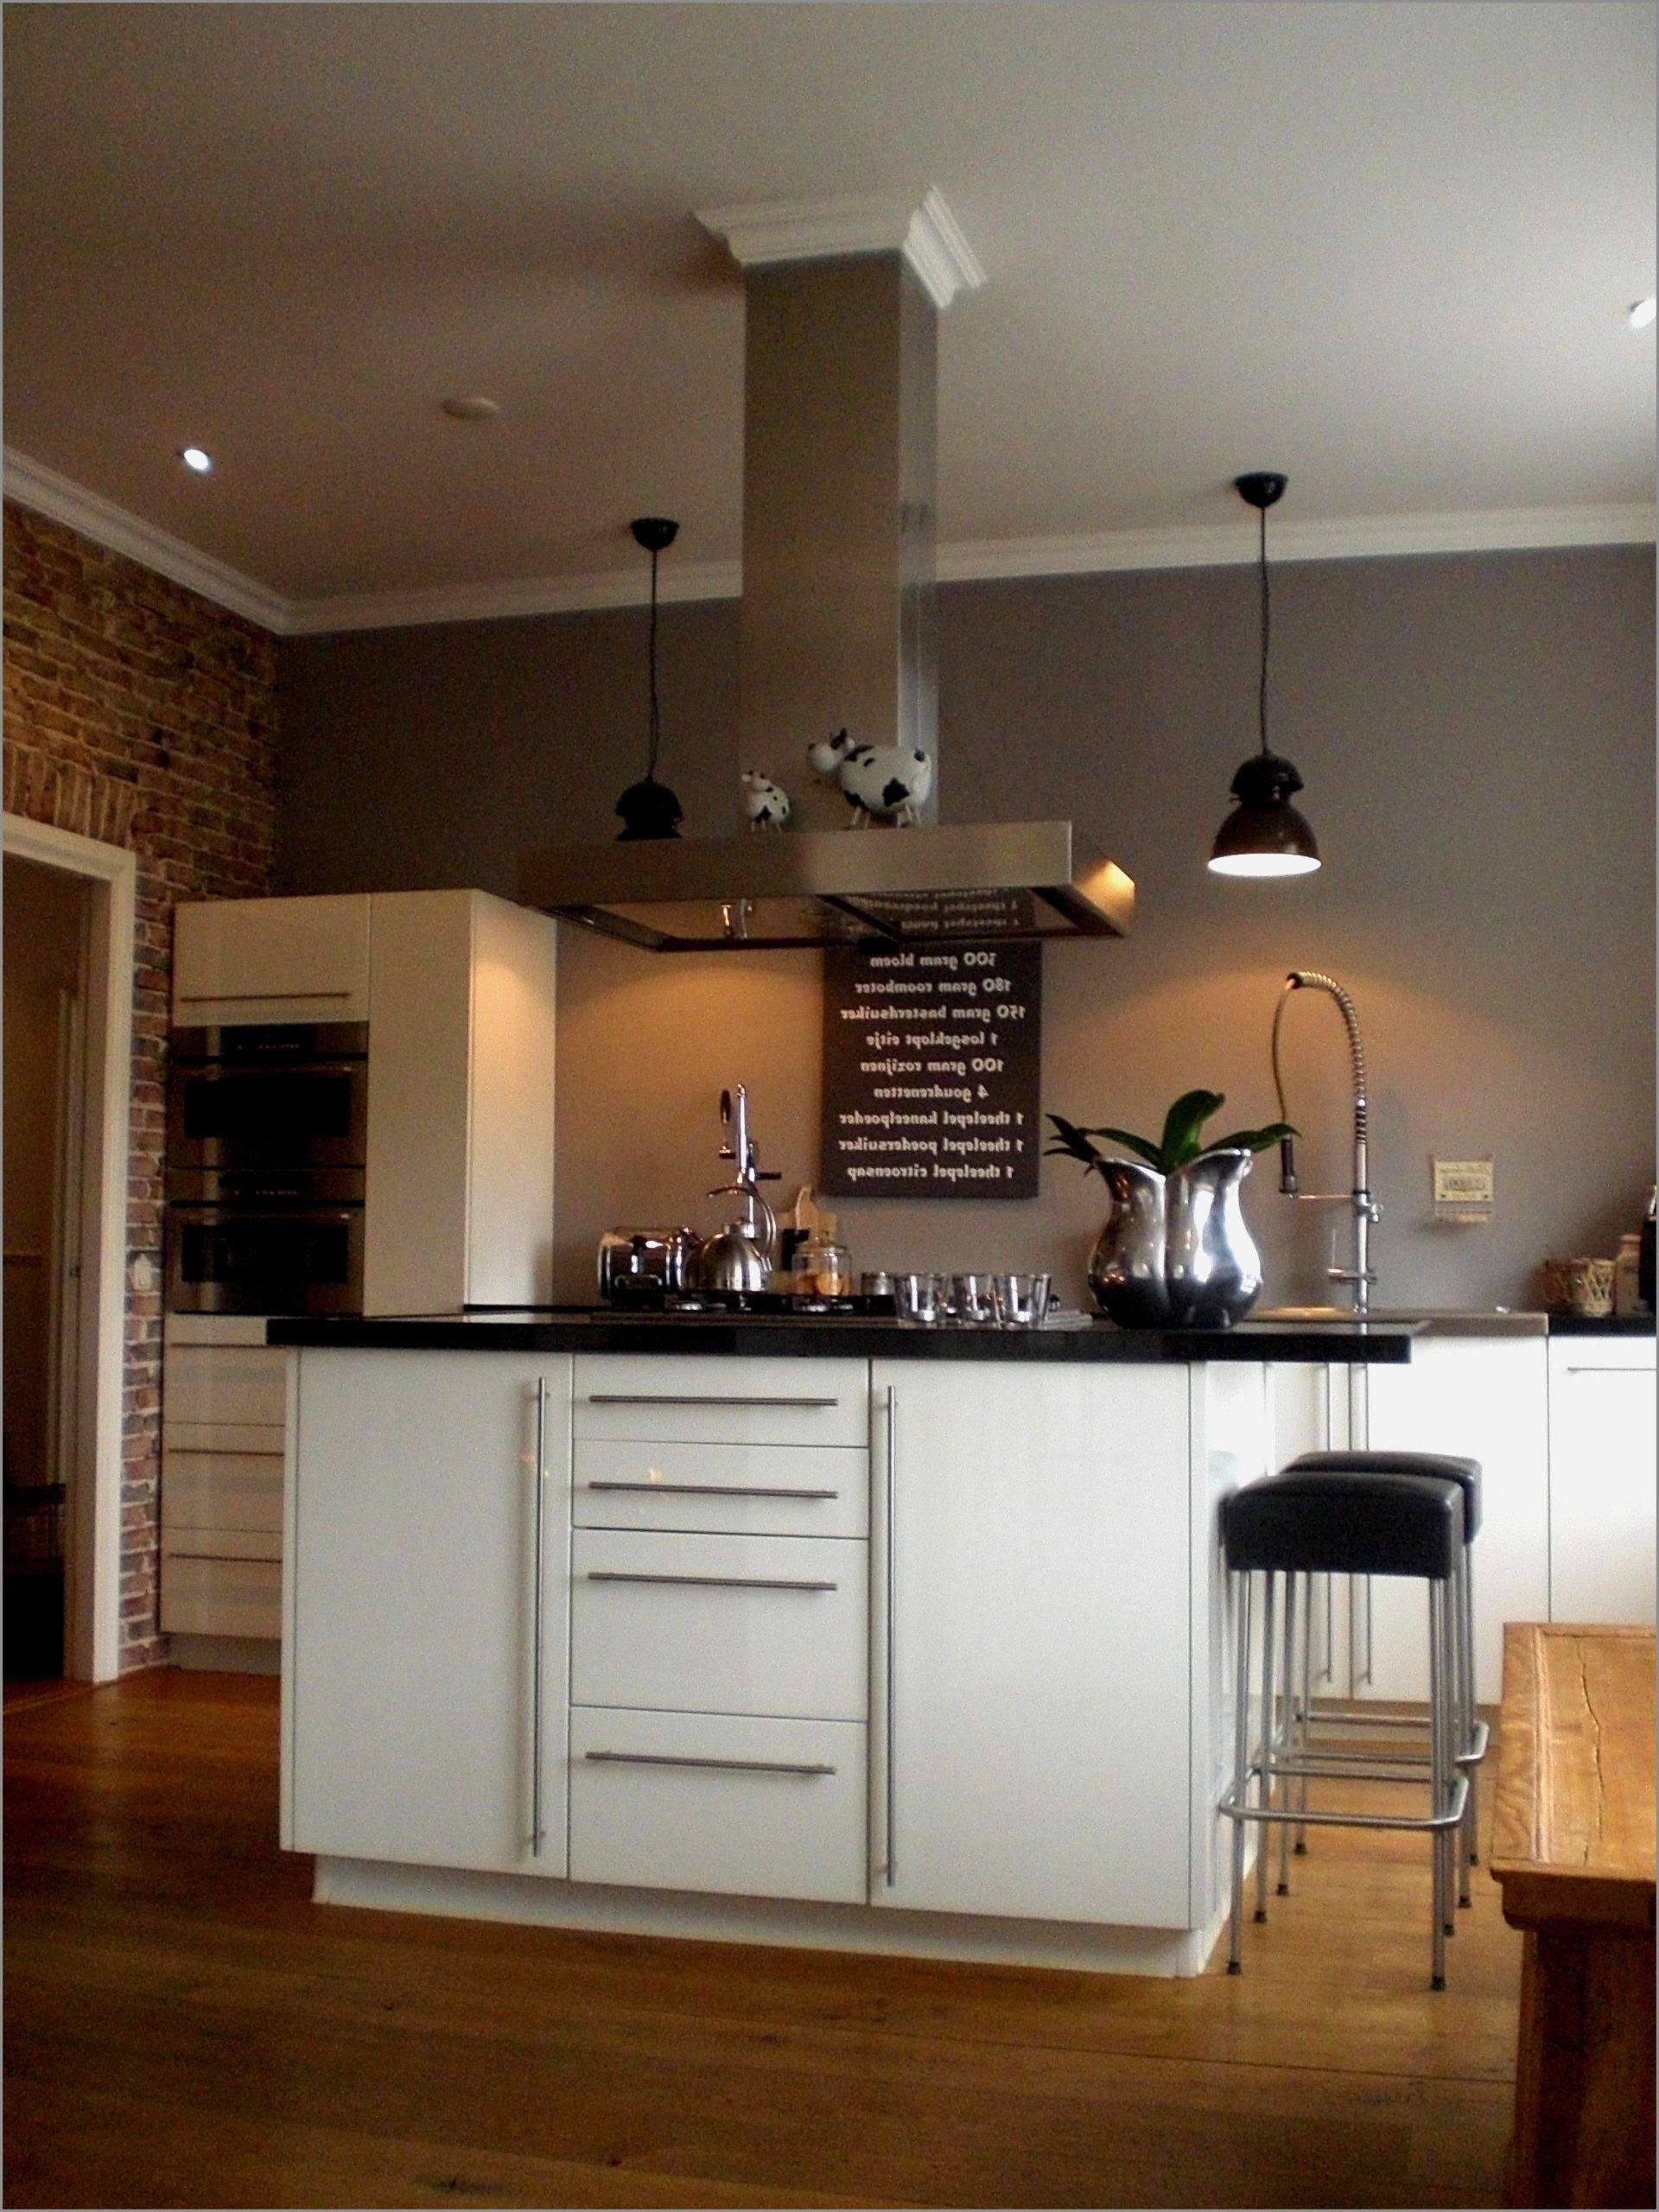 beistelltisch küche schlafzimmer ikea sitzgruppe wandtatoo